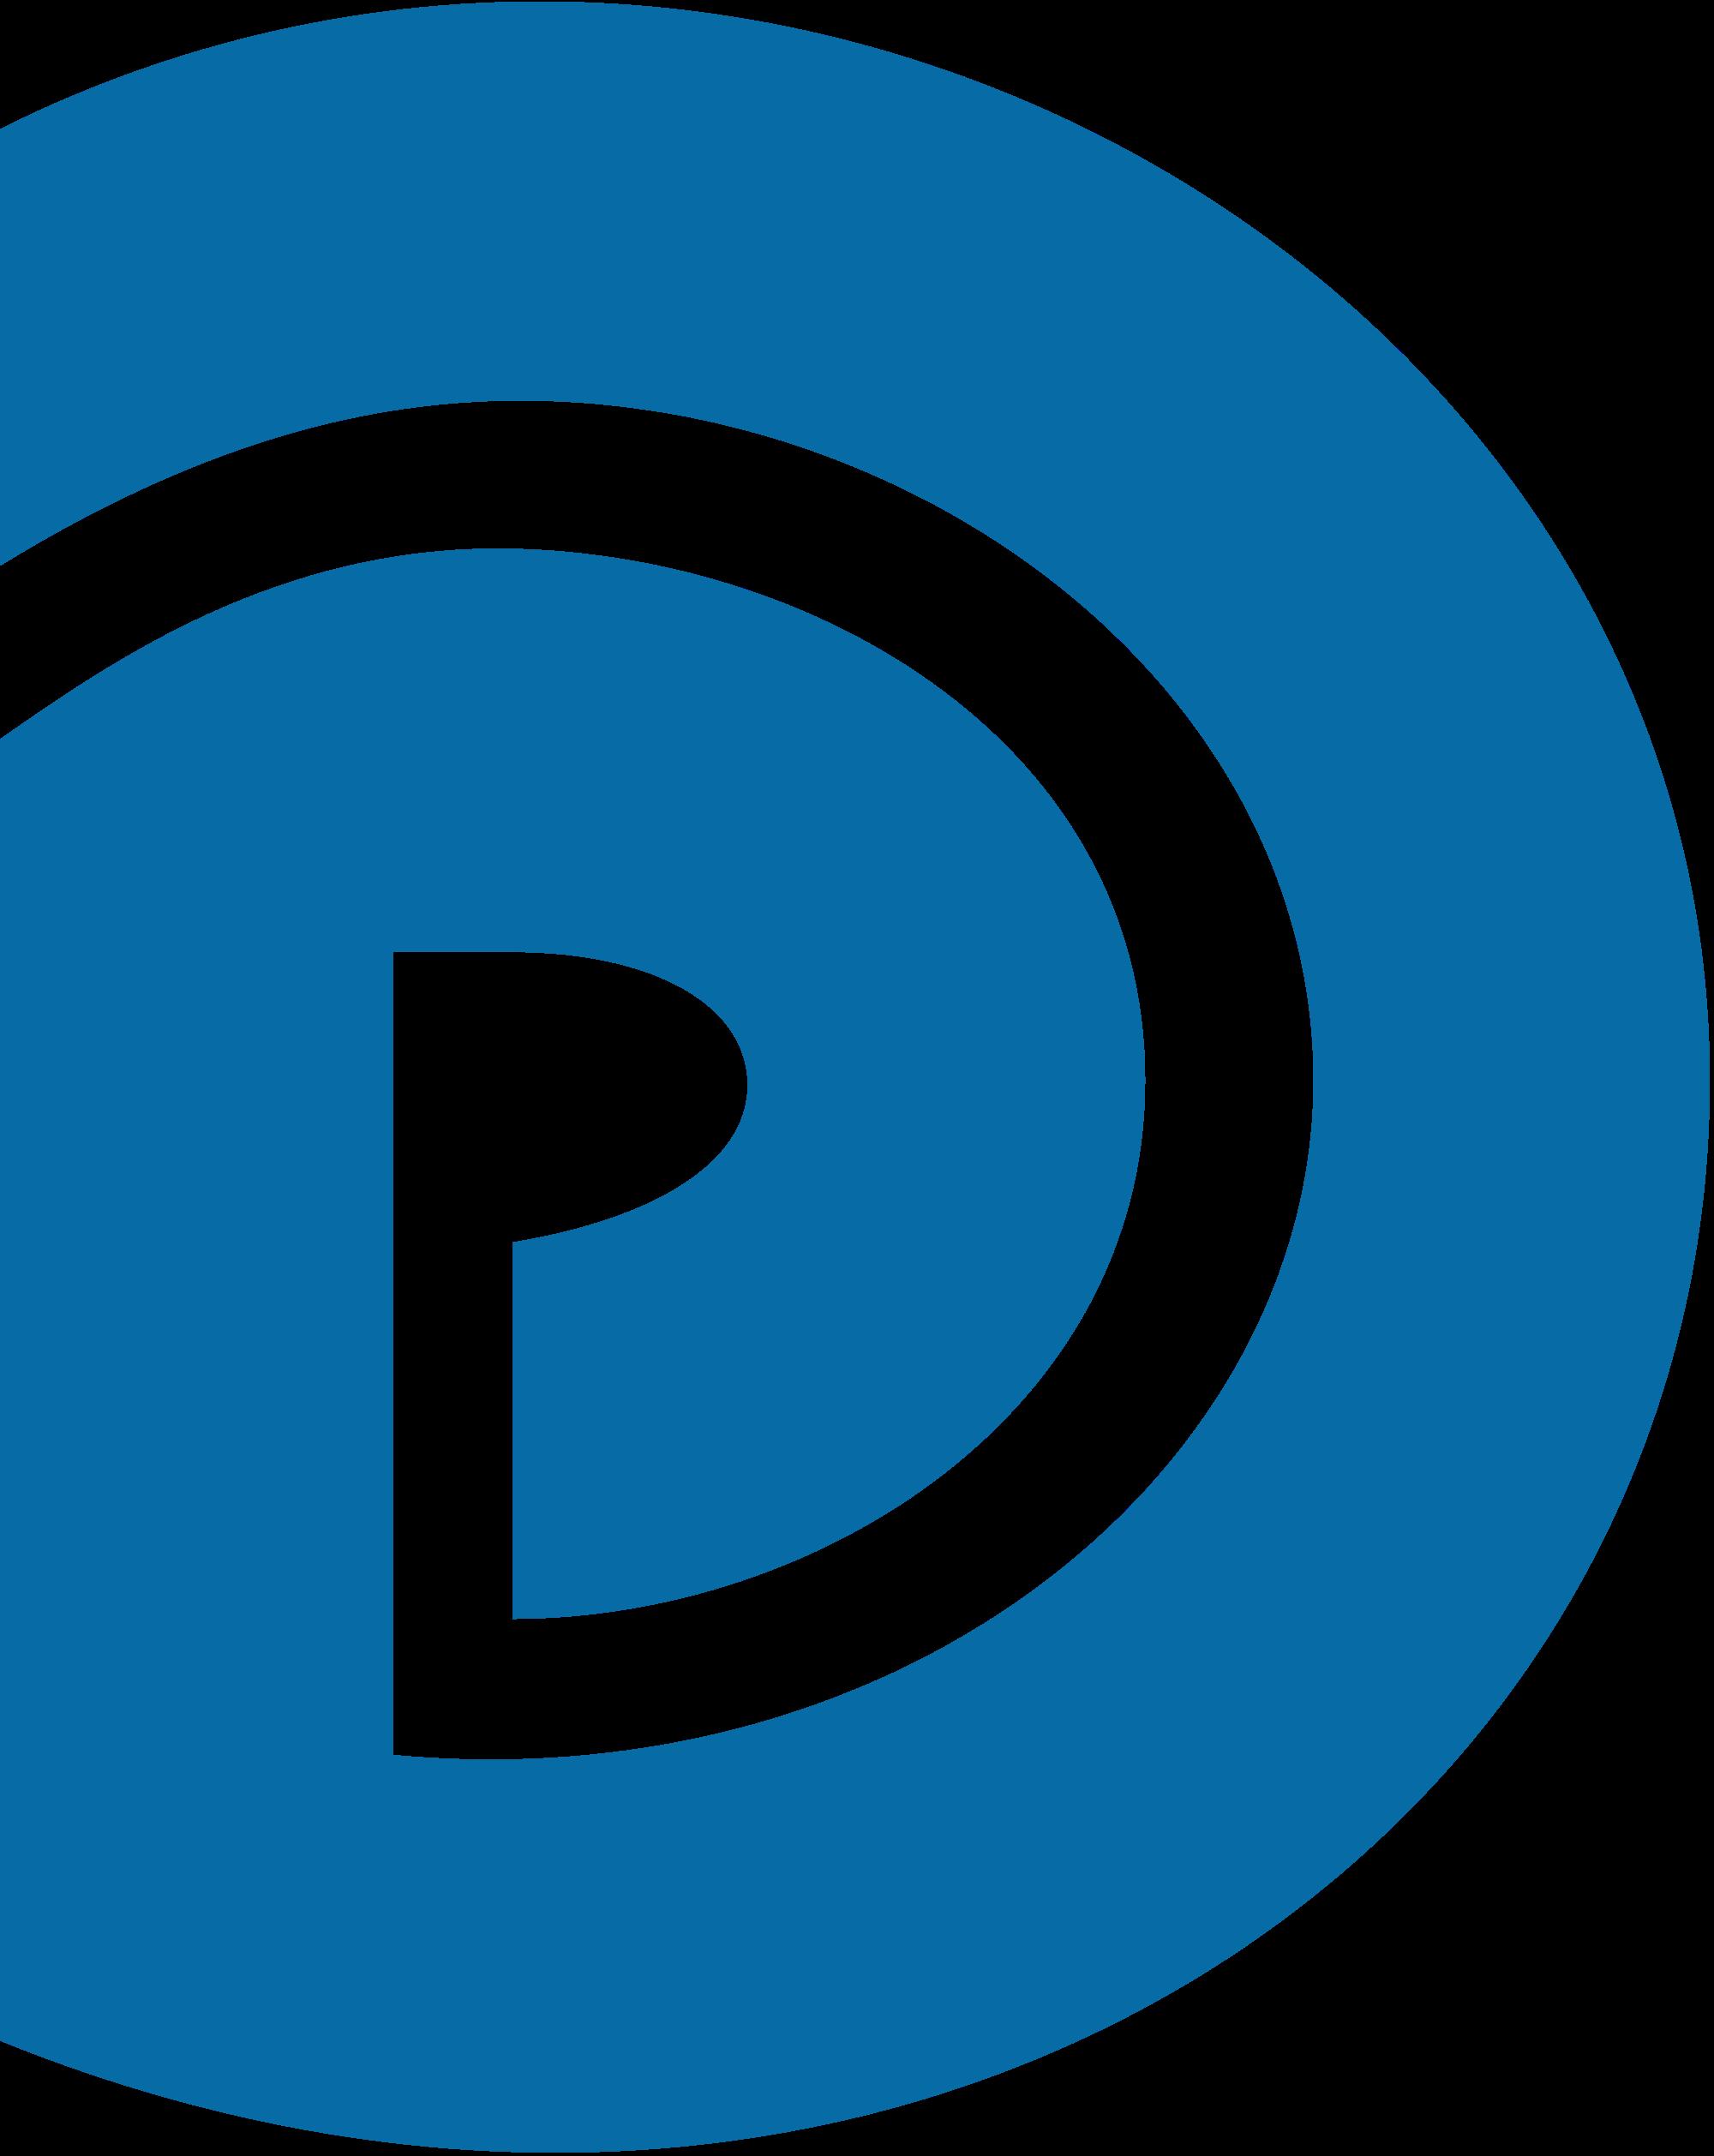 Democracy clipart greek democracy. Democratic party of albania